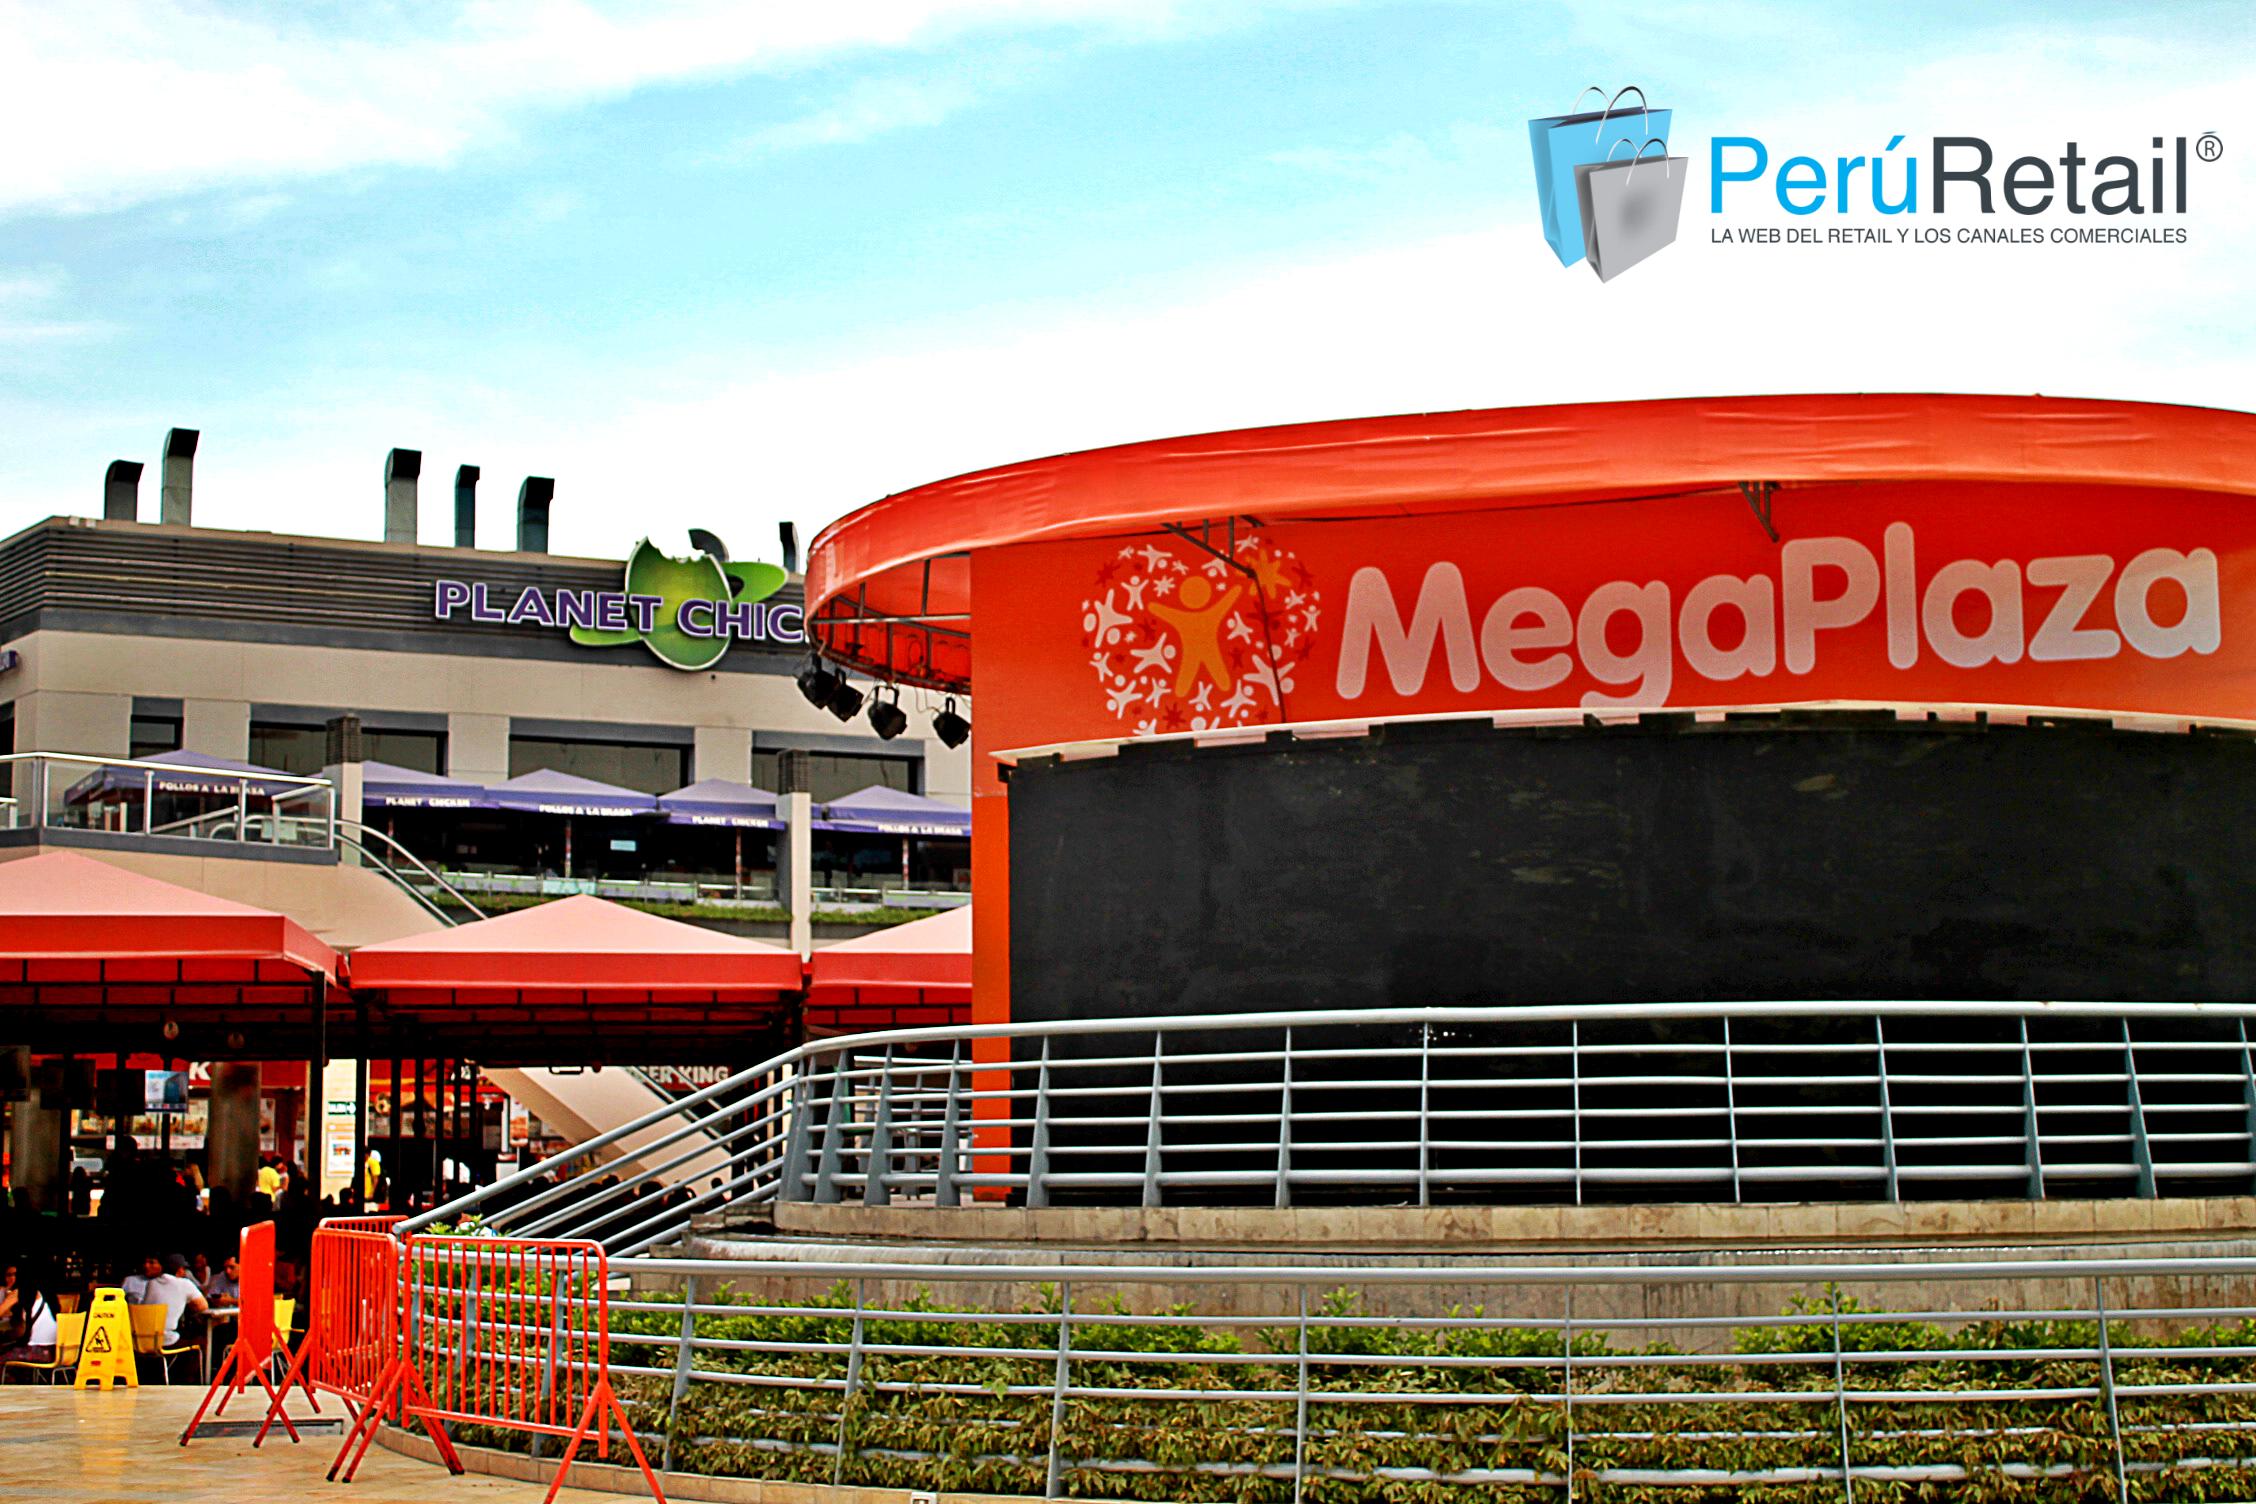 MegaPlaza 1 - Peru Retail